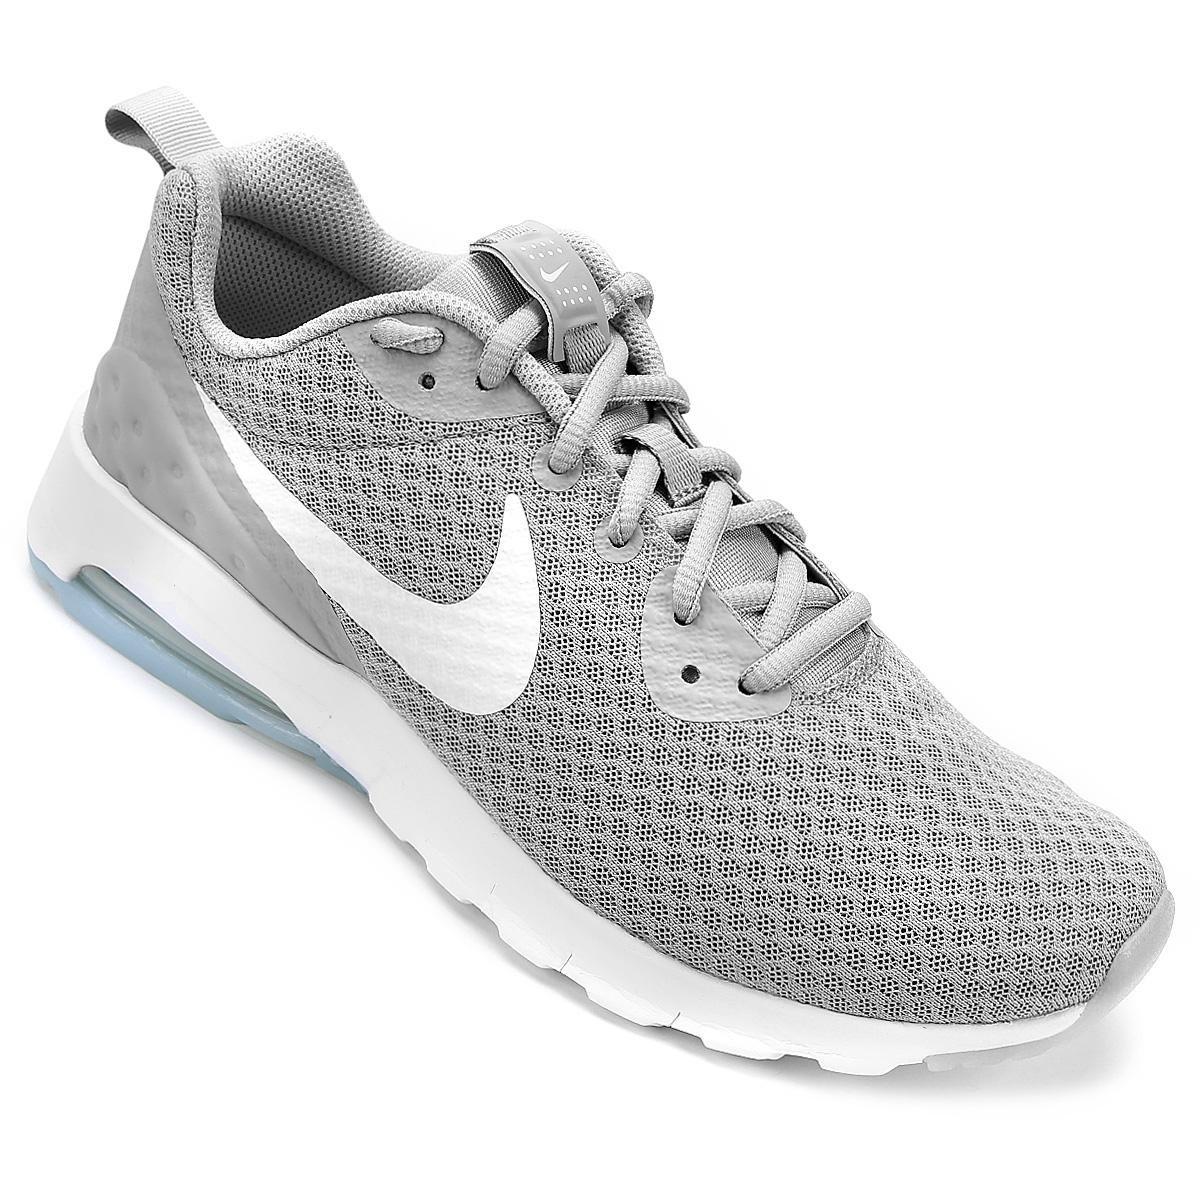 2a3f67c100 Tênis Nike Air Max Motion Lw Masculino | Shop Timão